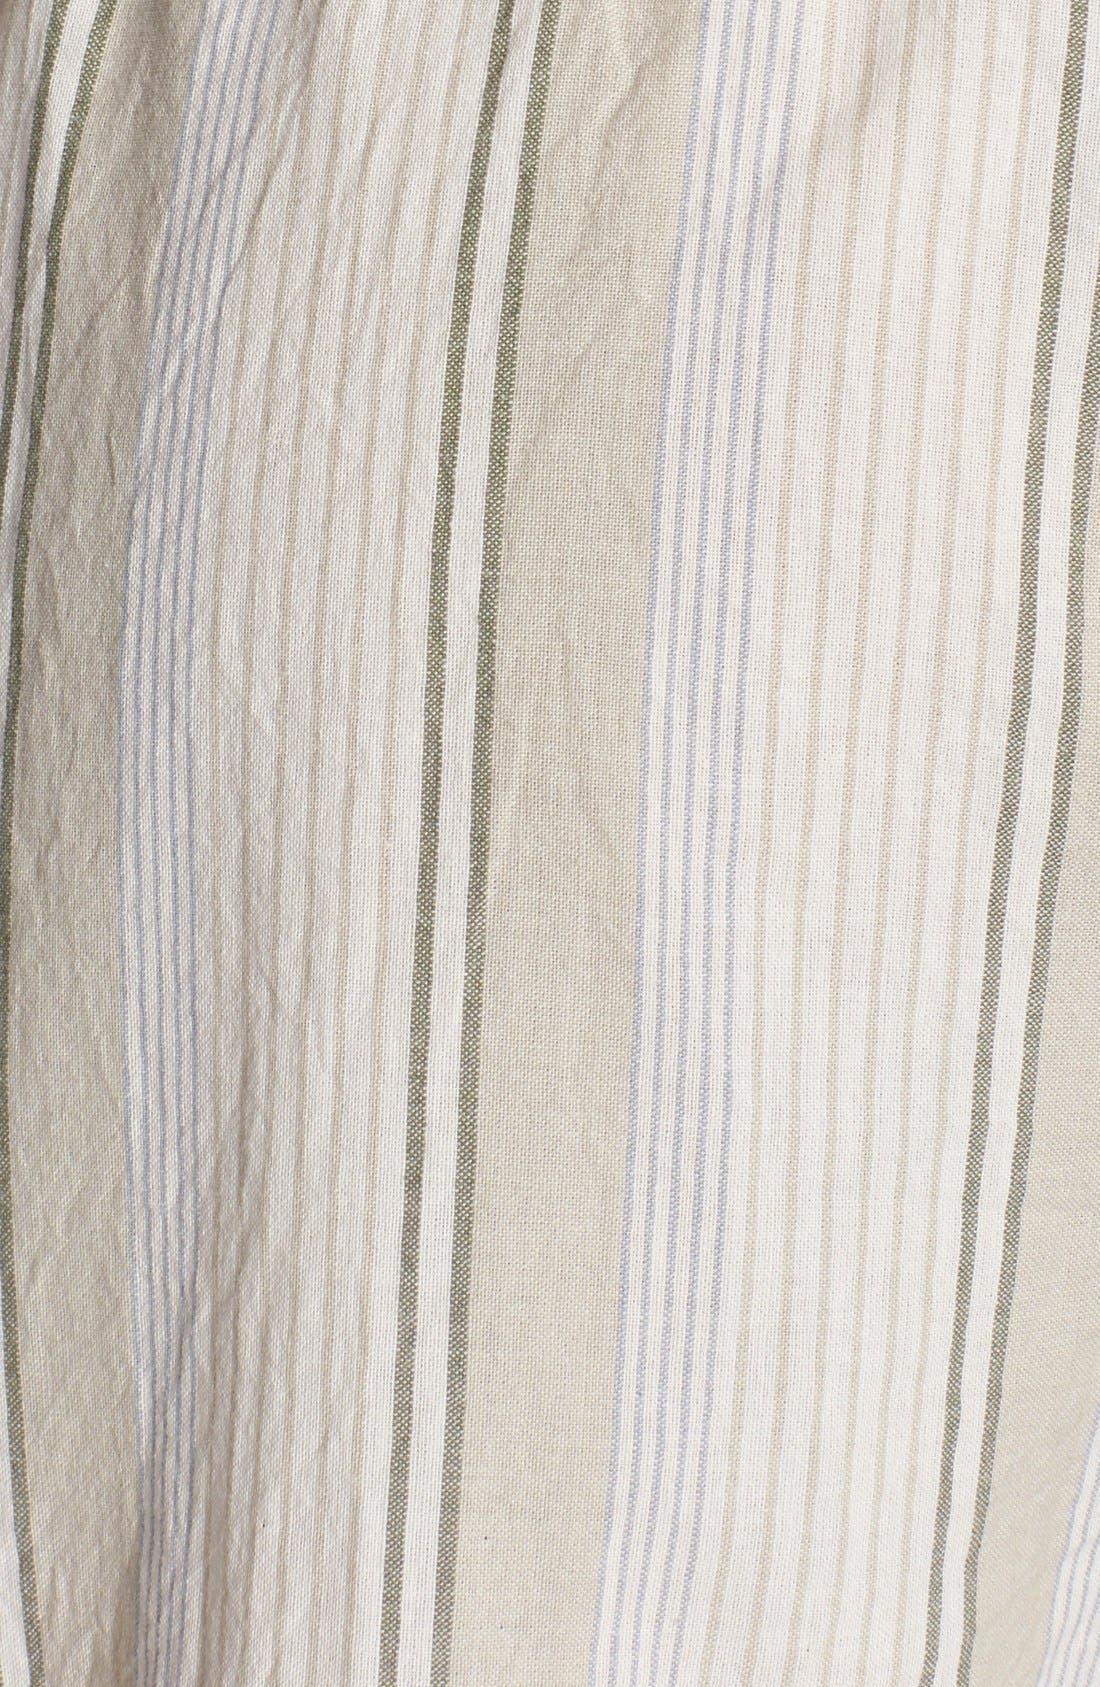 'Boho' Print Lounge Pants,                             Alternate thumbnail 3, color,                             101